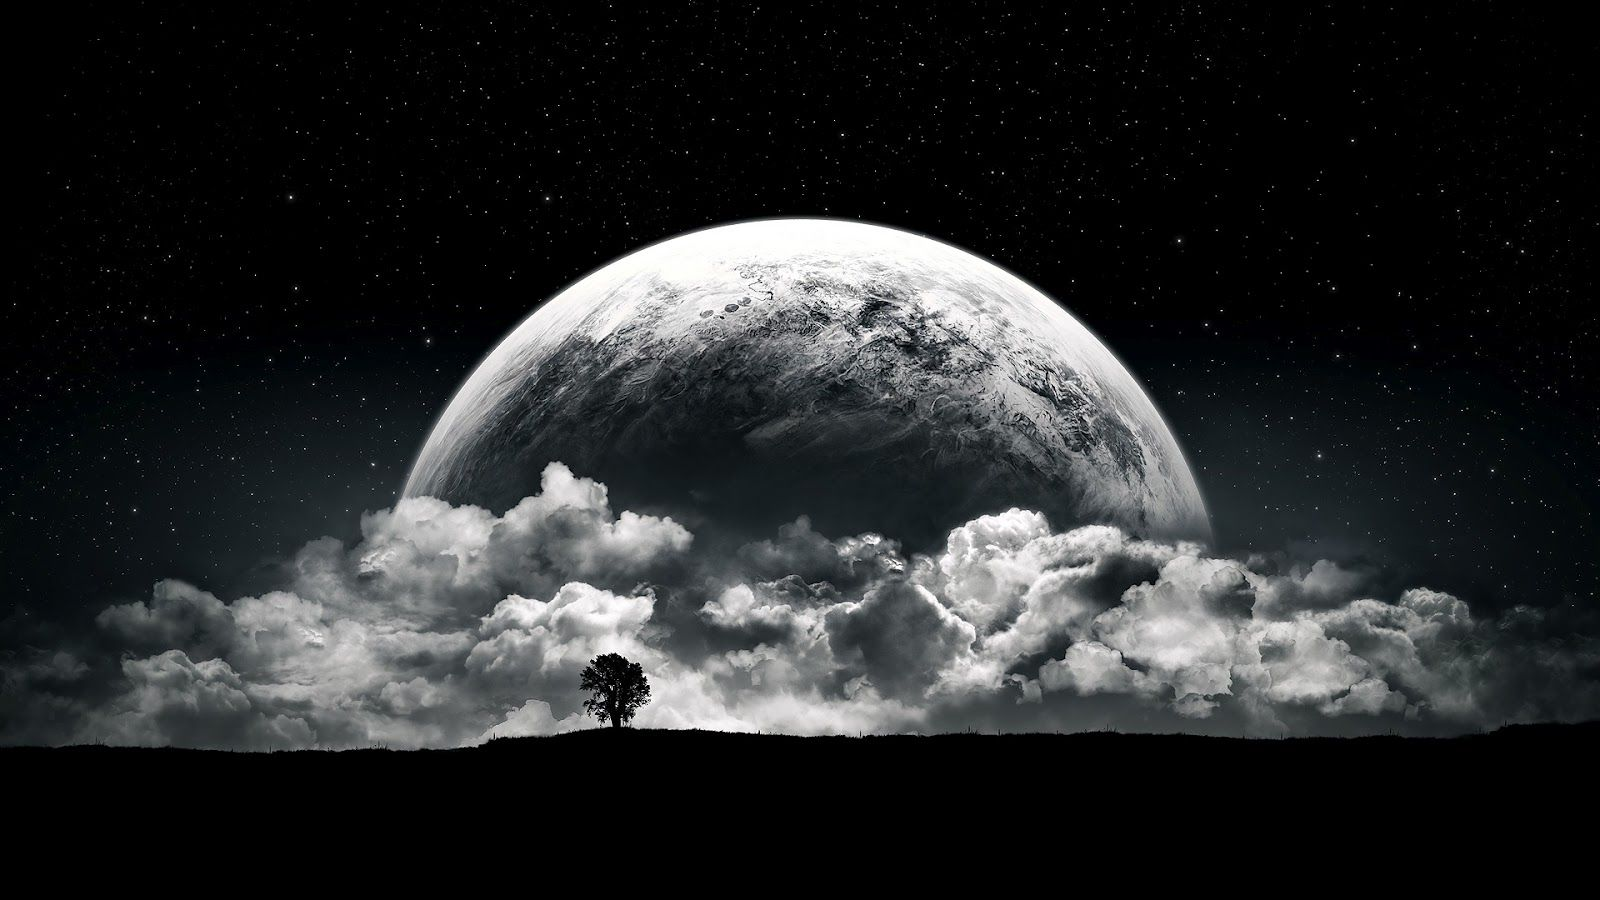 Melancholy Full Moon Full HD Wallpapers 1080p Cool Art